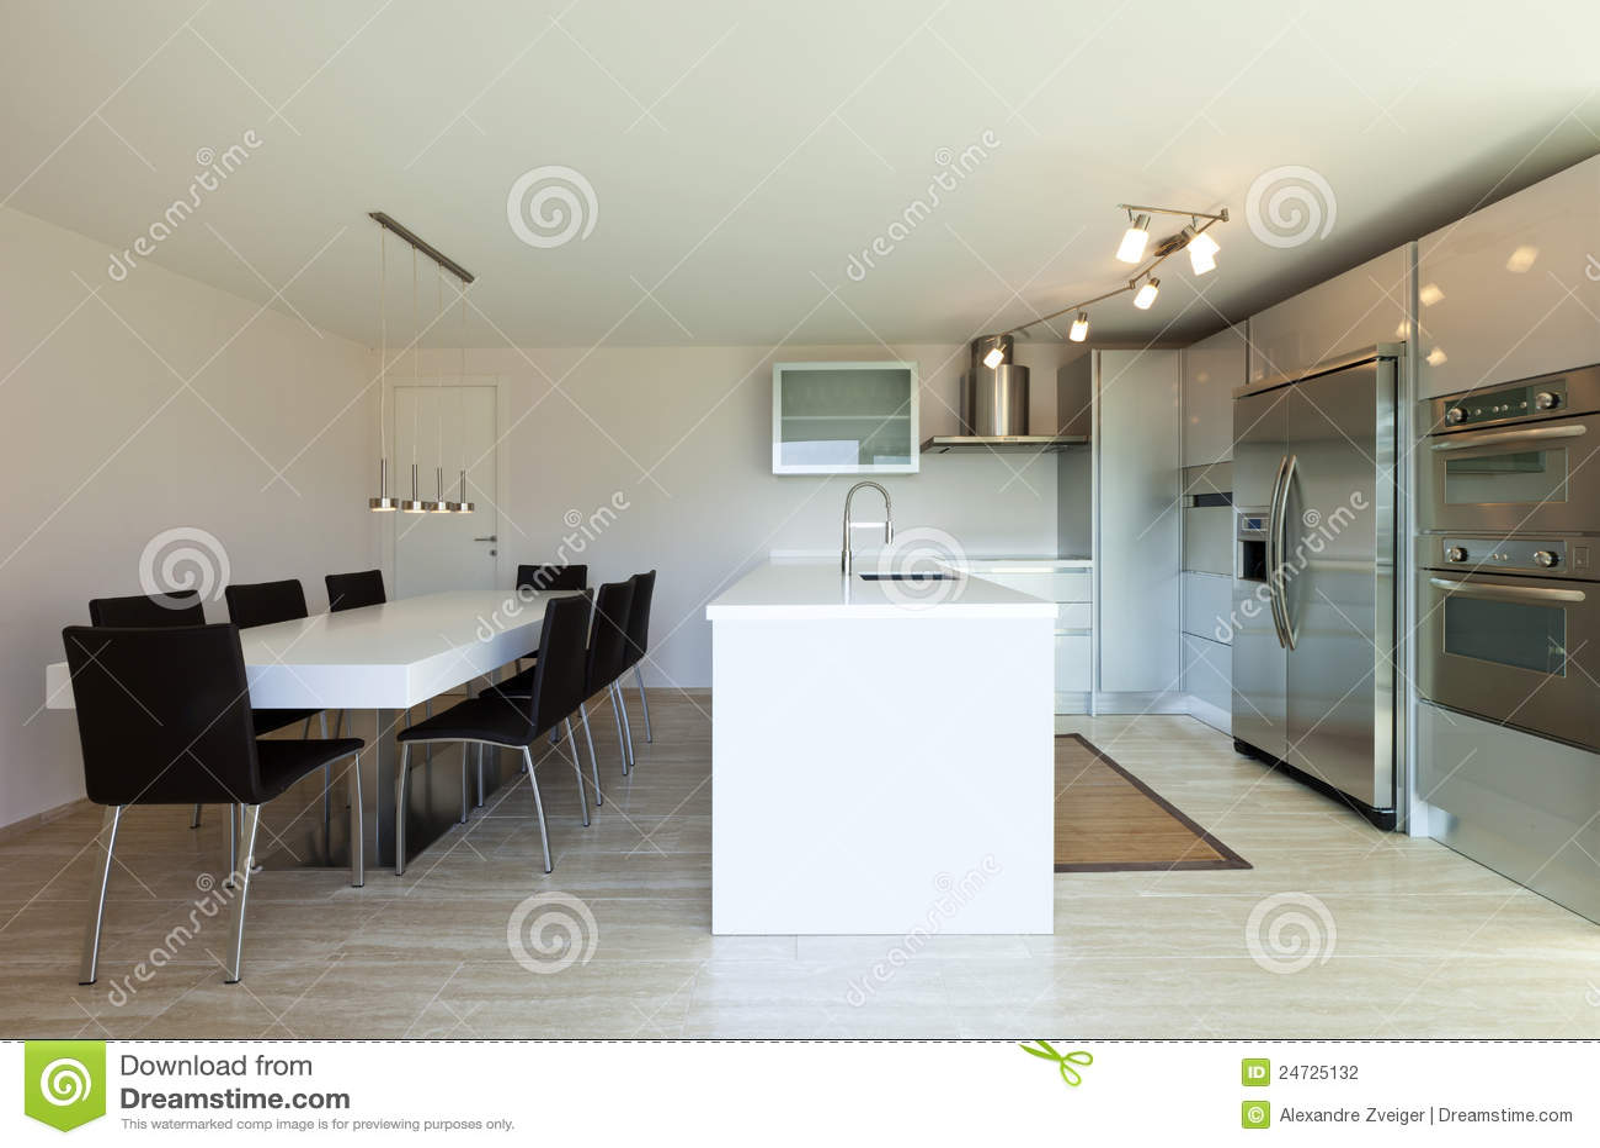 Eigentijdse keuken keukentafel keukens driessen keukens keuken